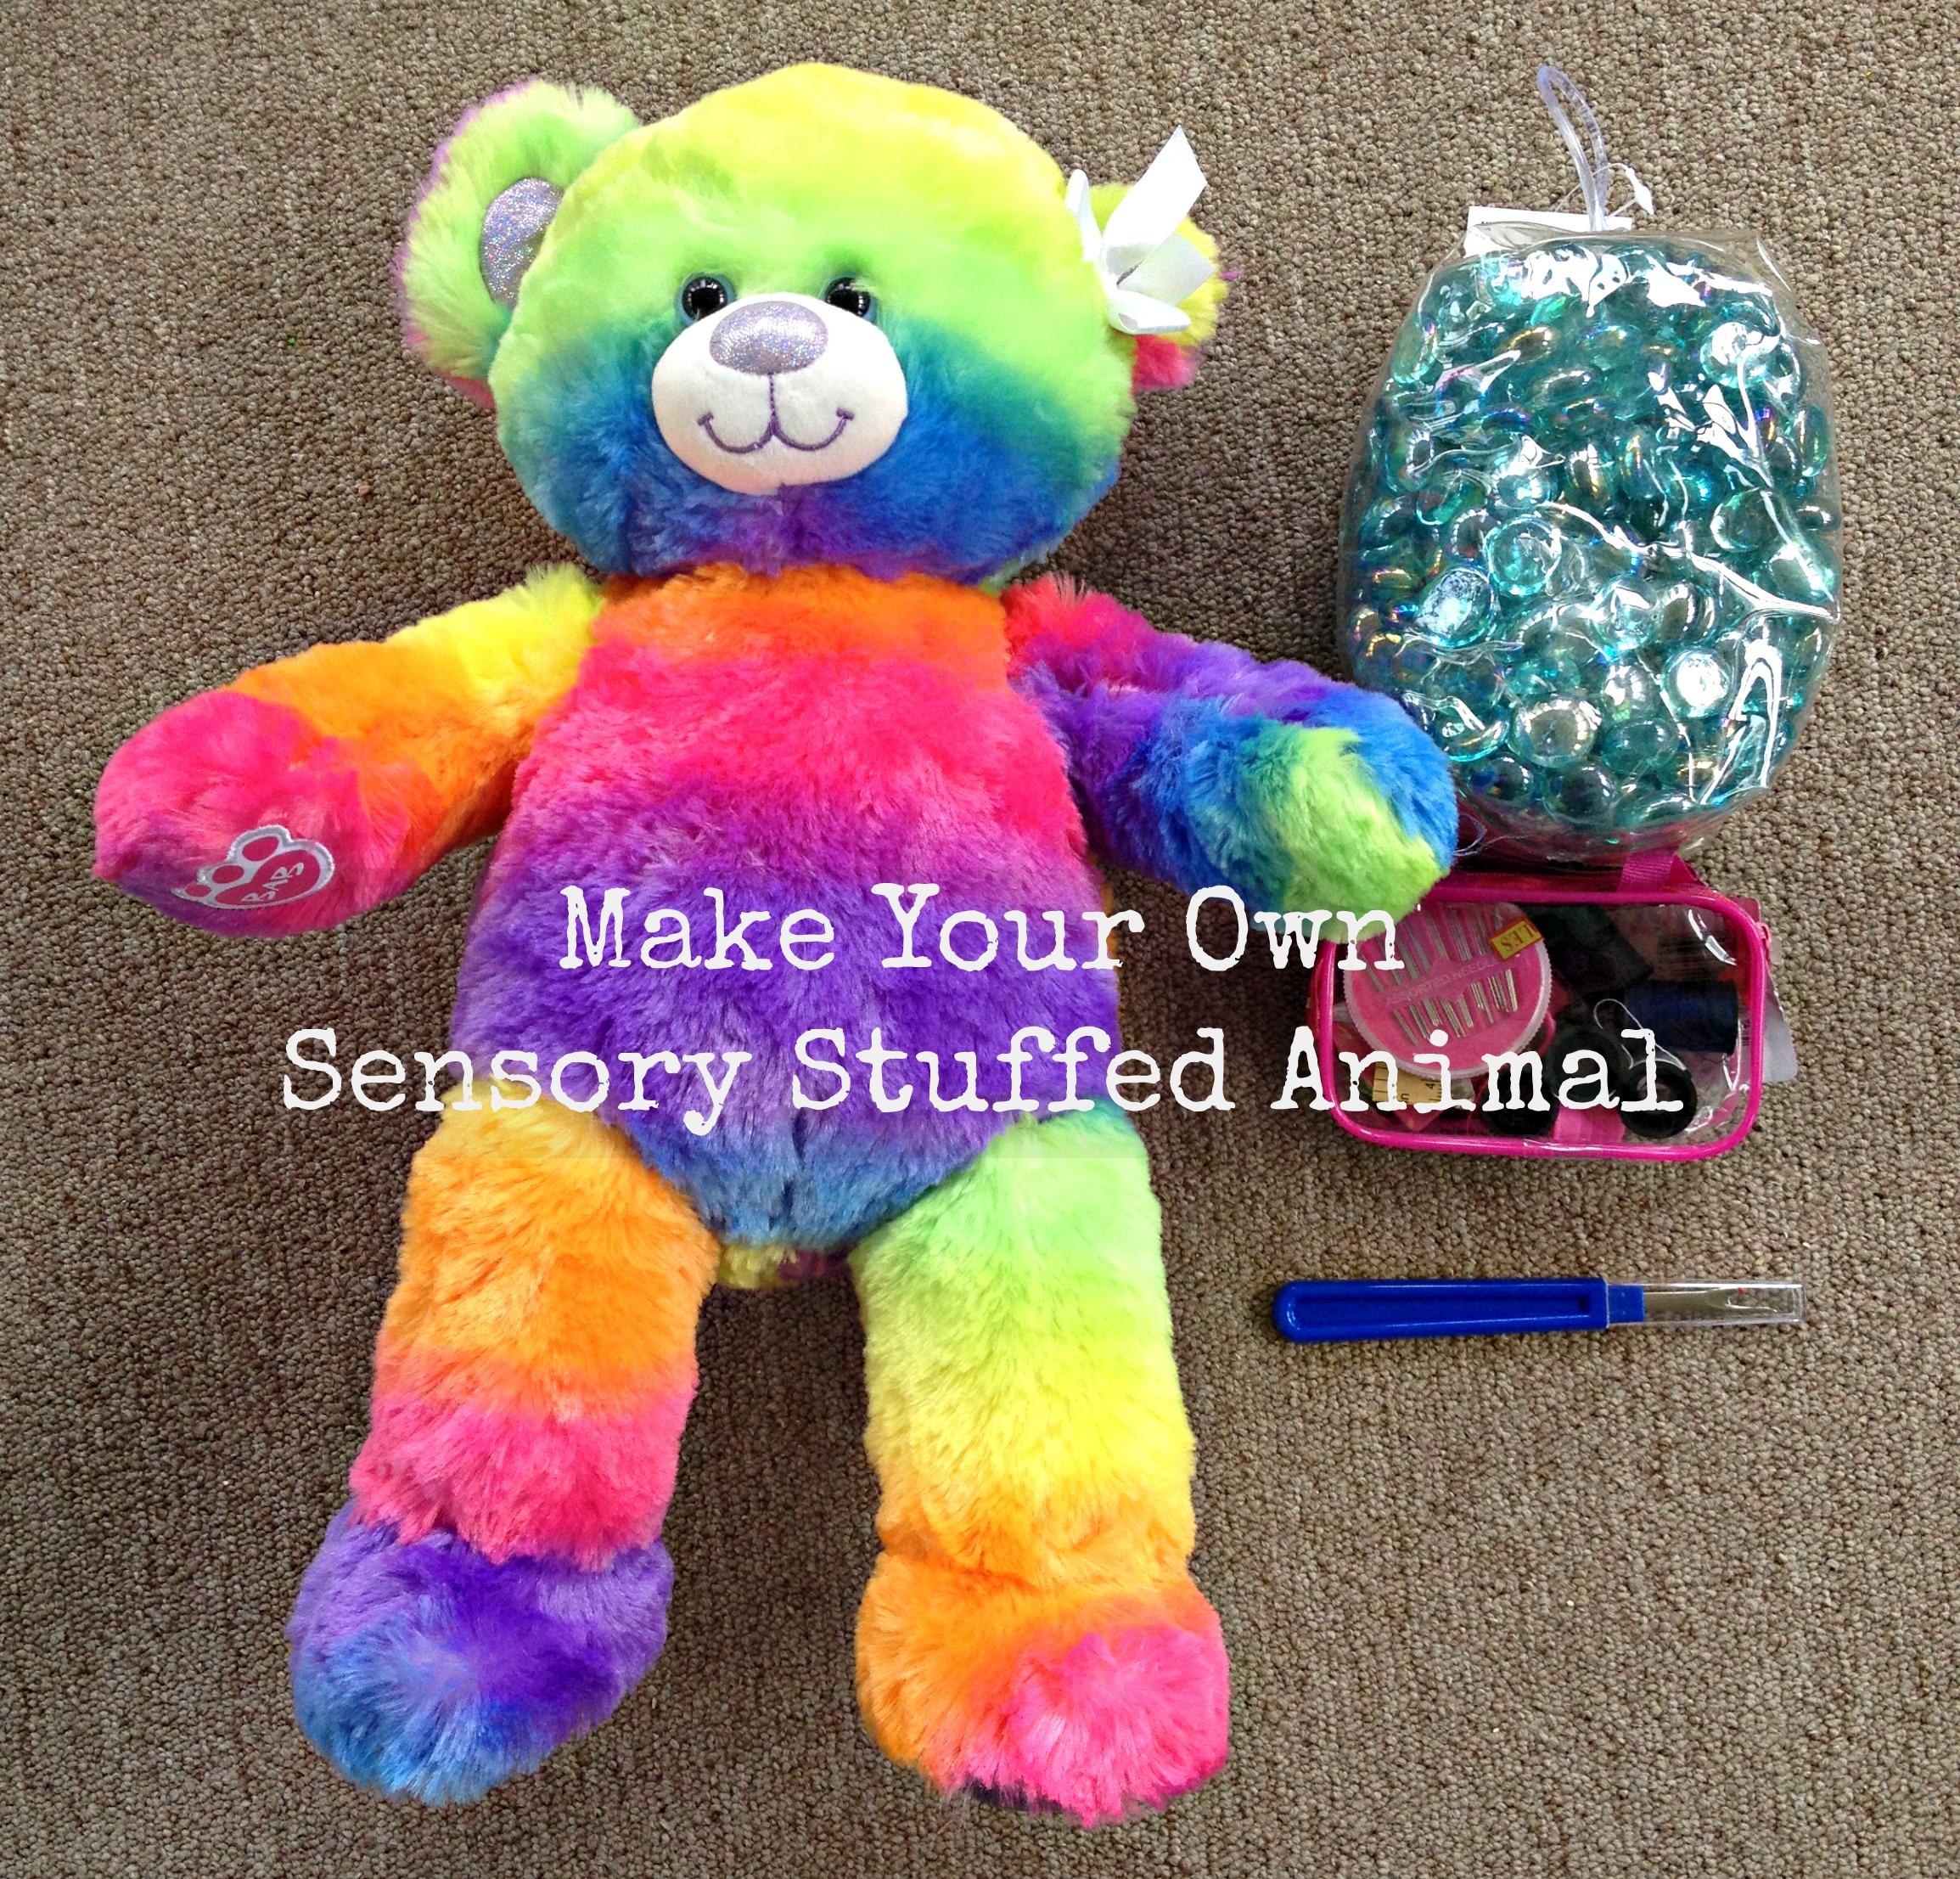 10 Ways to Use Weighted Sensory Stuffed Animals